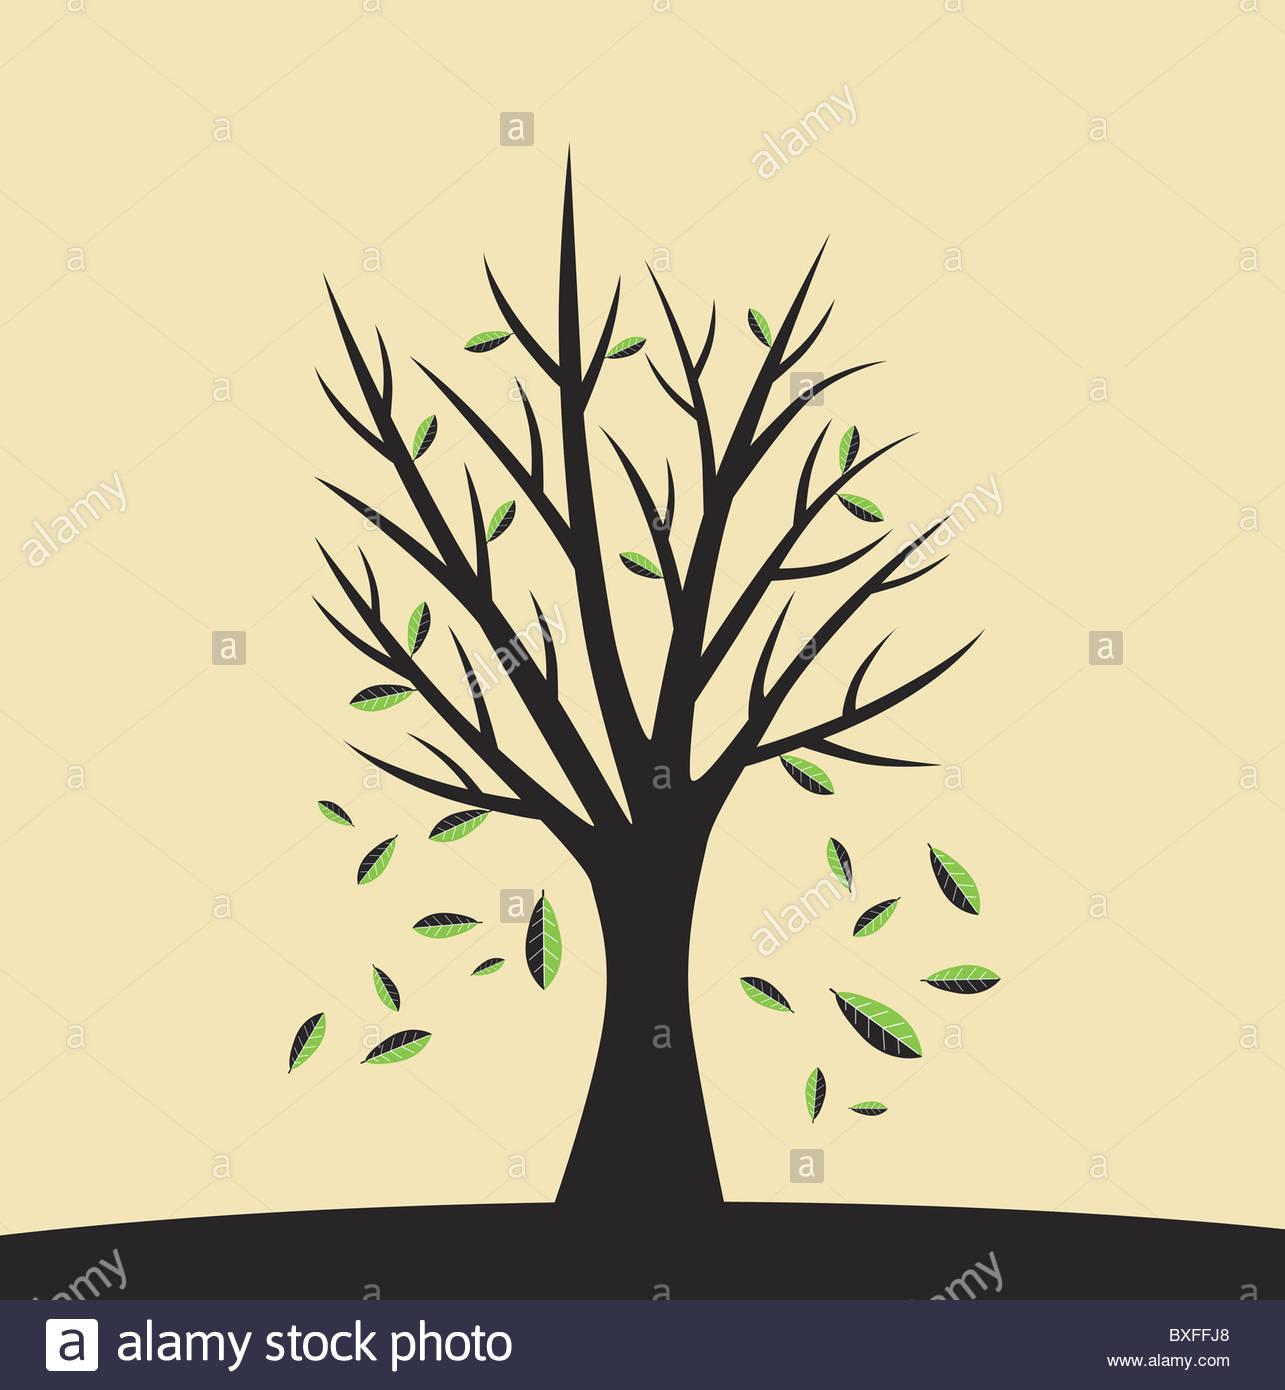 Falling leaves illustration - Stock Image